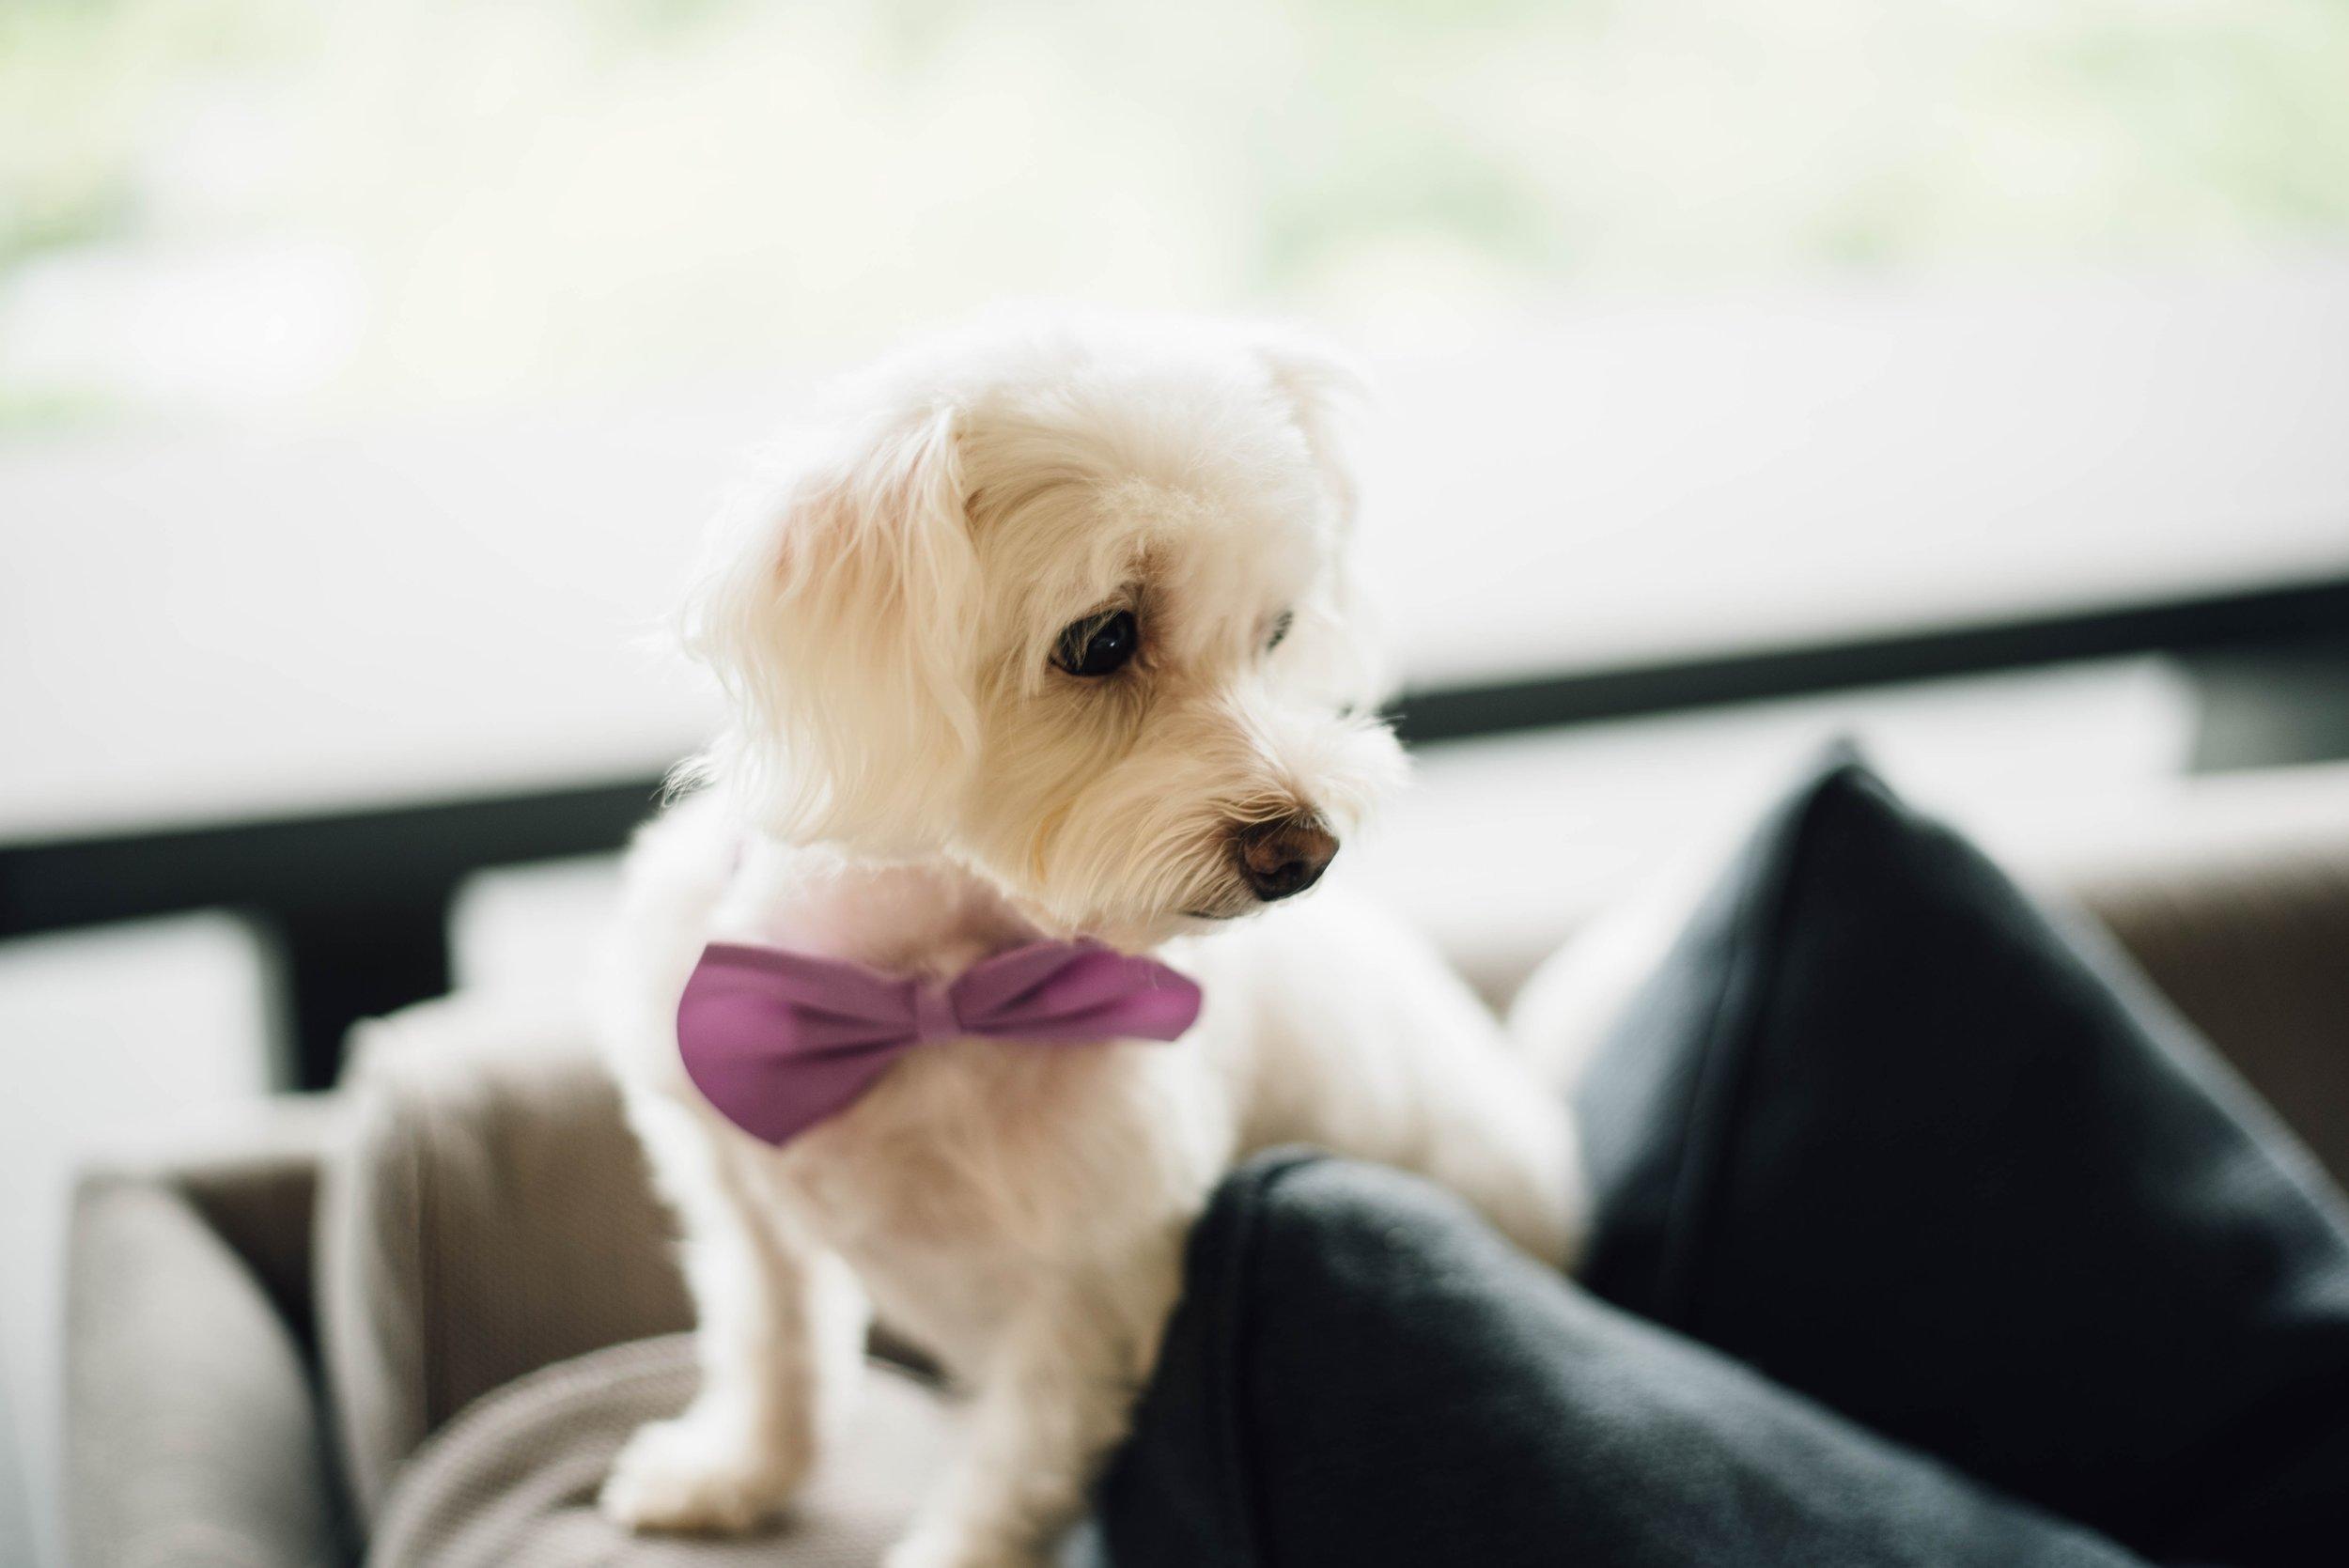 The Hottest Trends in Wedding Entertainment Animals www.redeventweddingfayres.com/blog